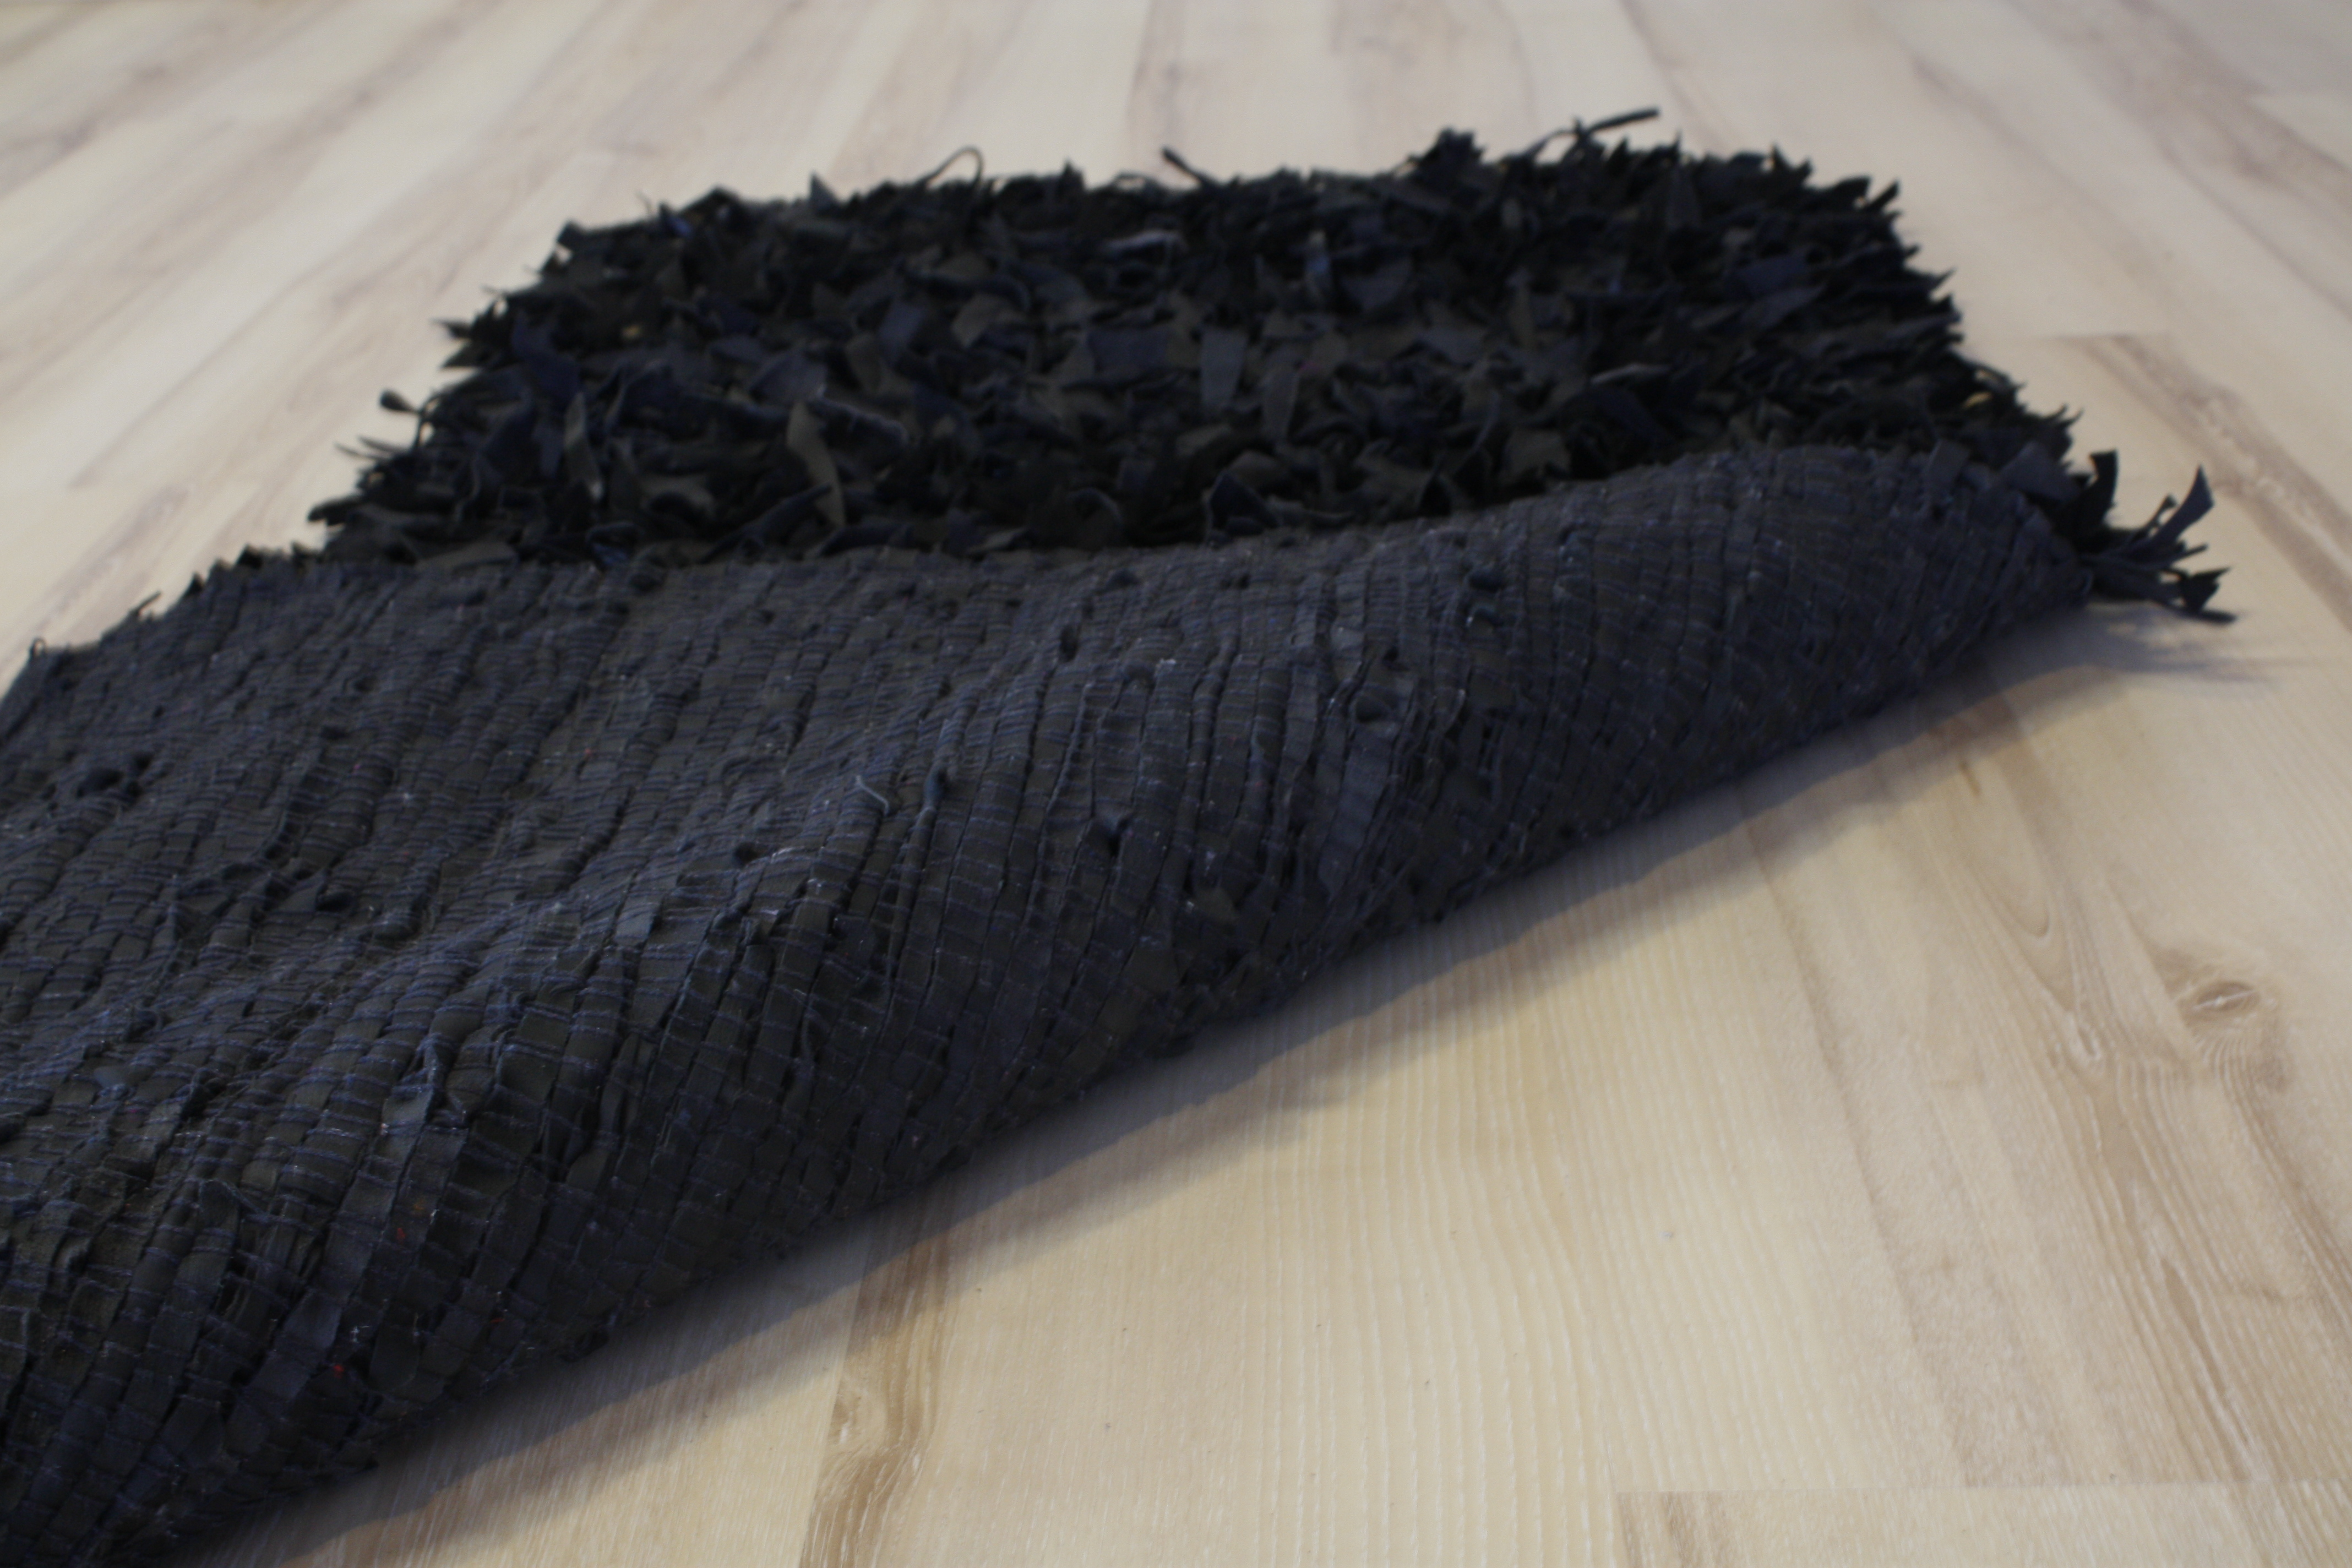 Leather carpet high pile black 200×200 cm Genuine Leather